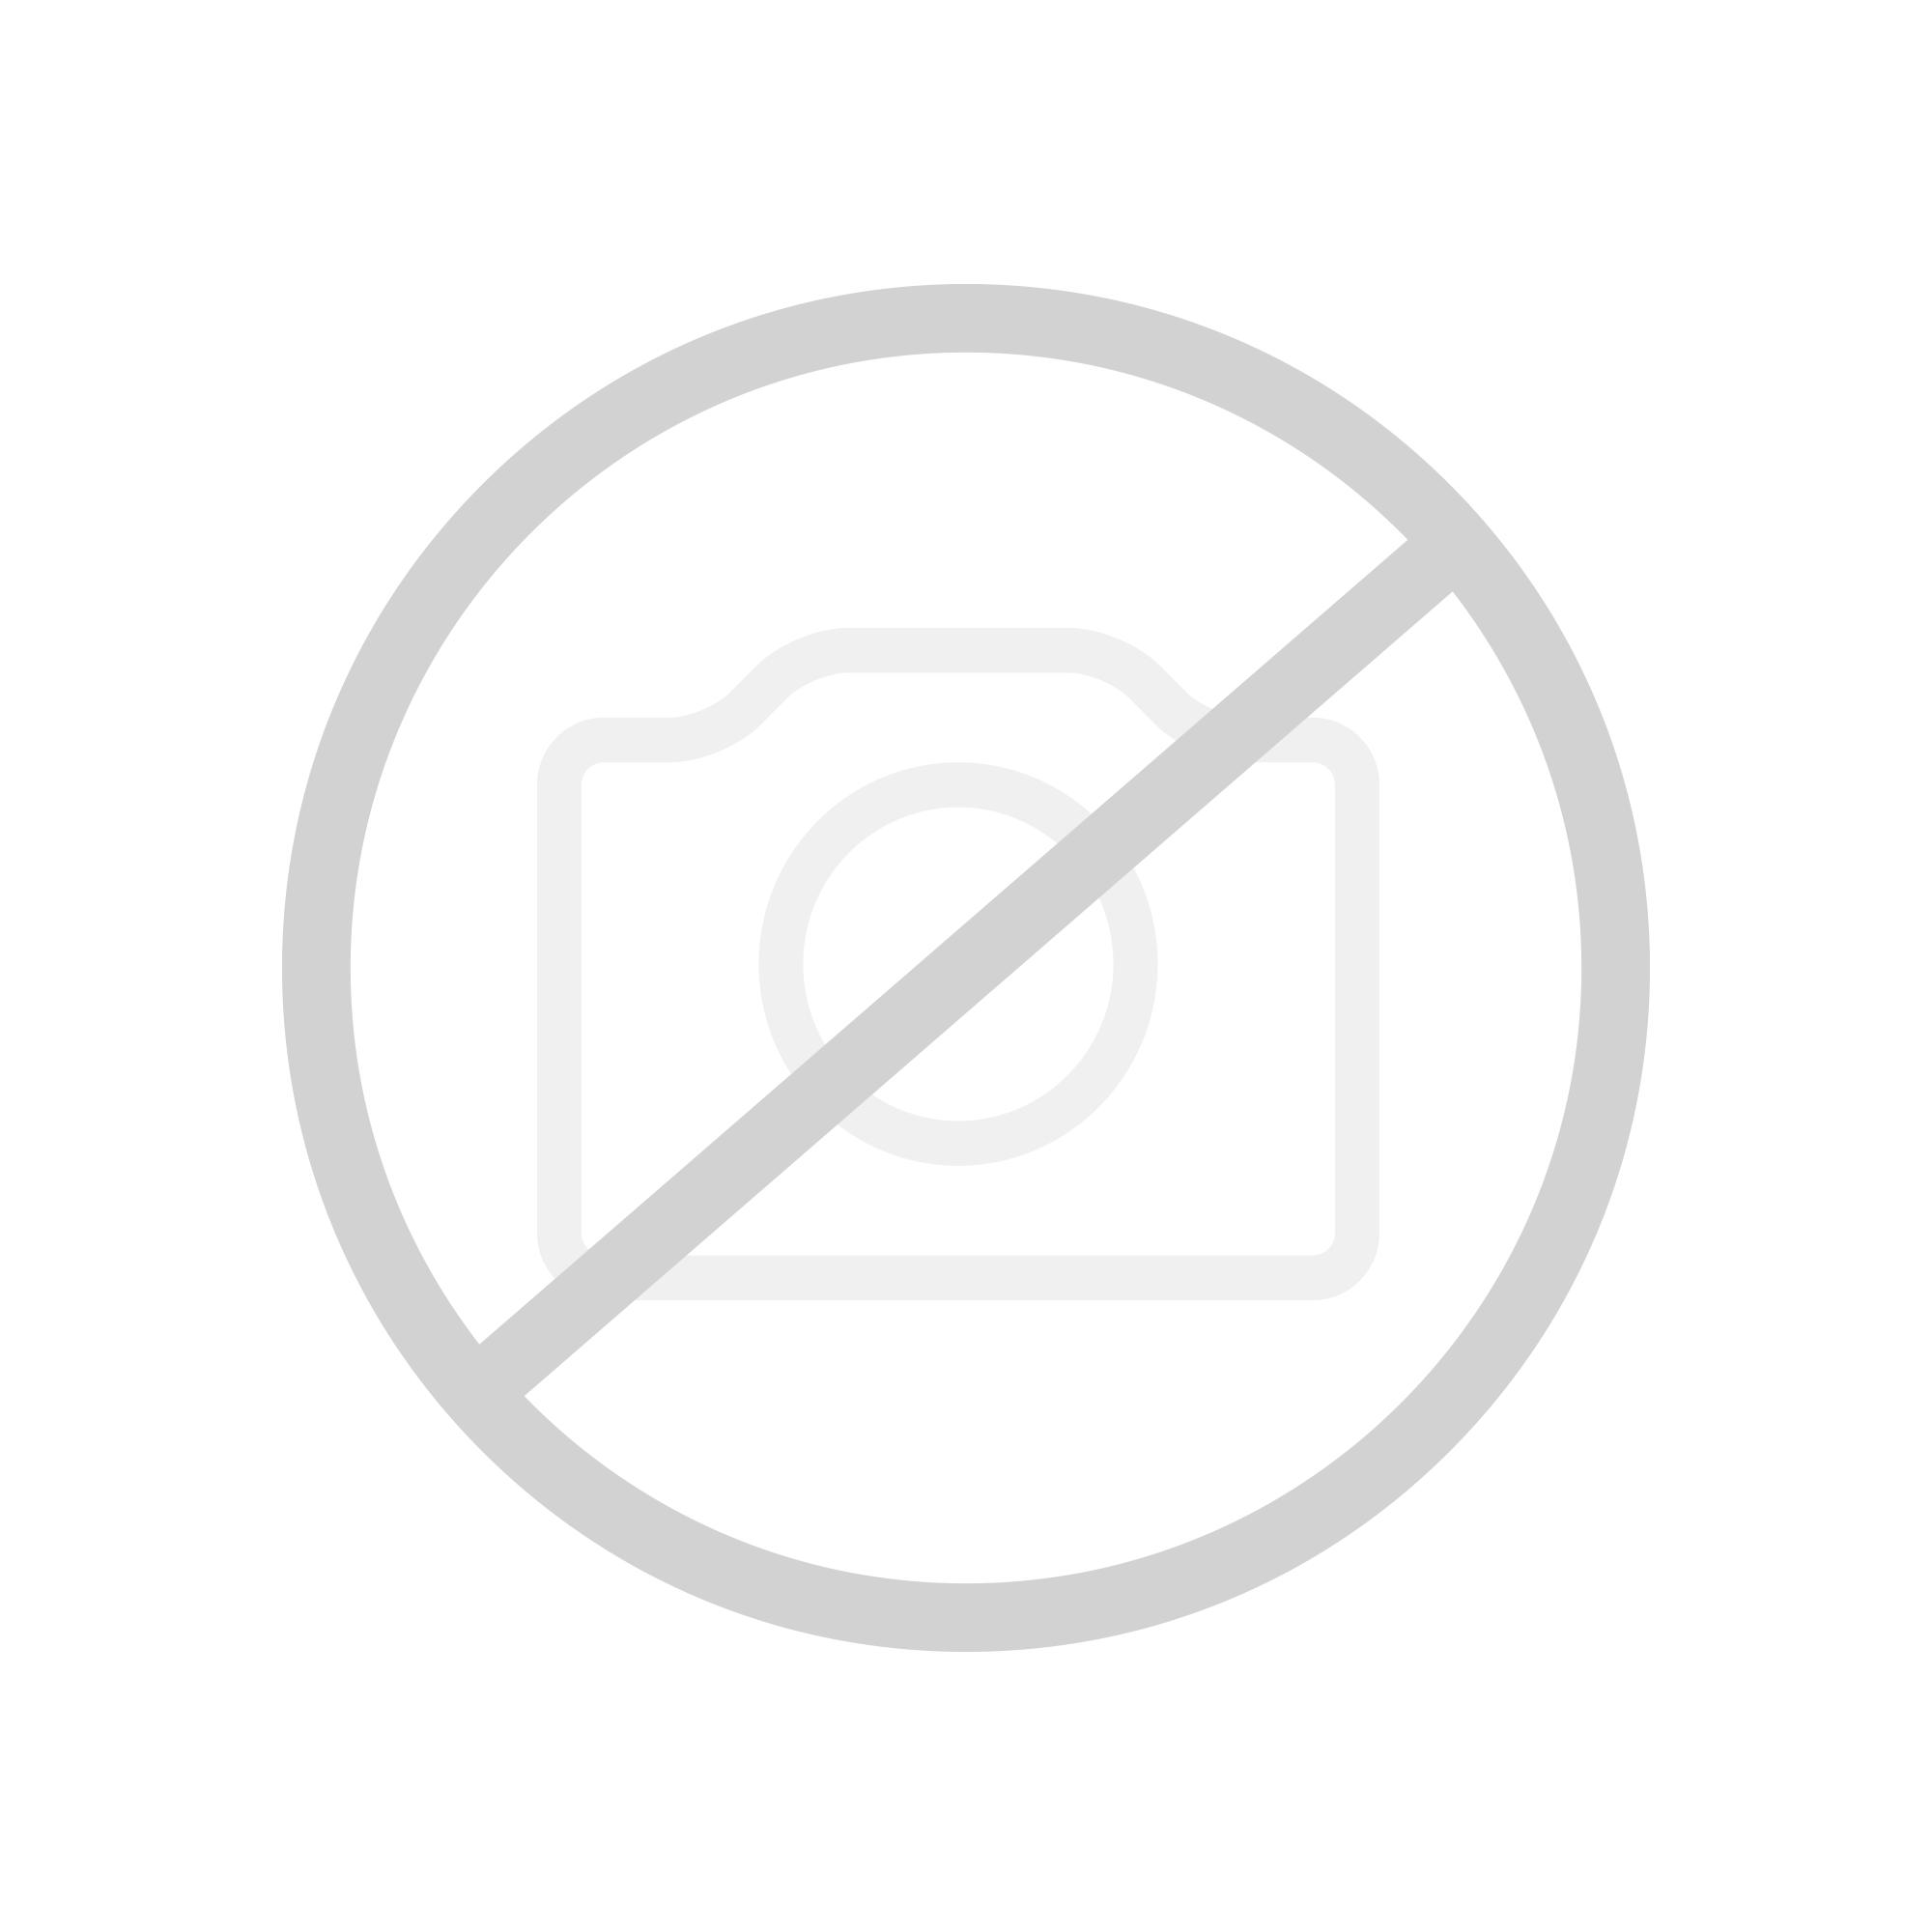 badaccessoires g nstig kaufen badzubeh r reuter onlineshop. Black Bedroom Furniture Sets. Home Design Ideas